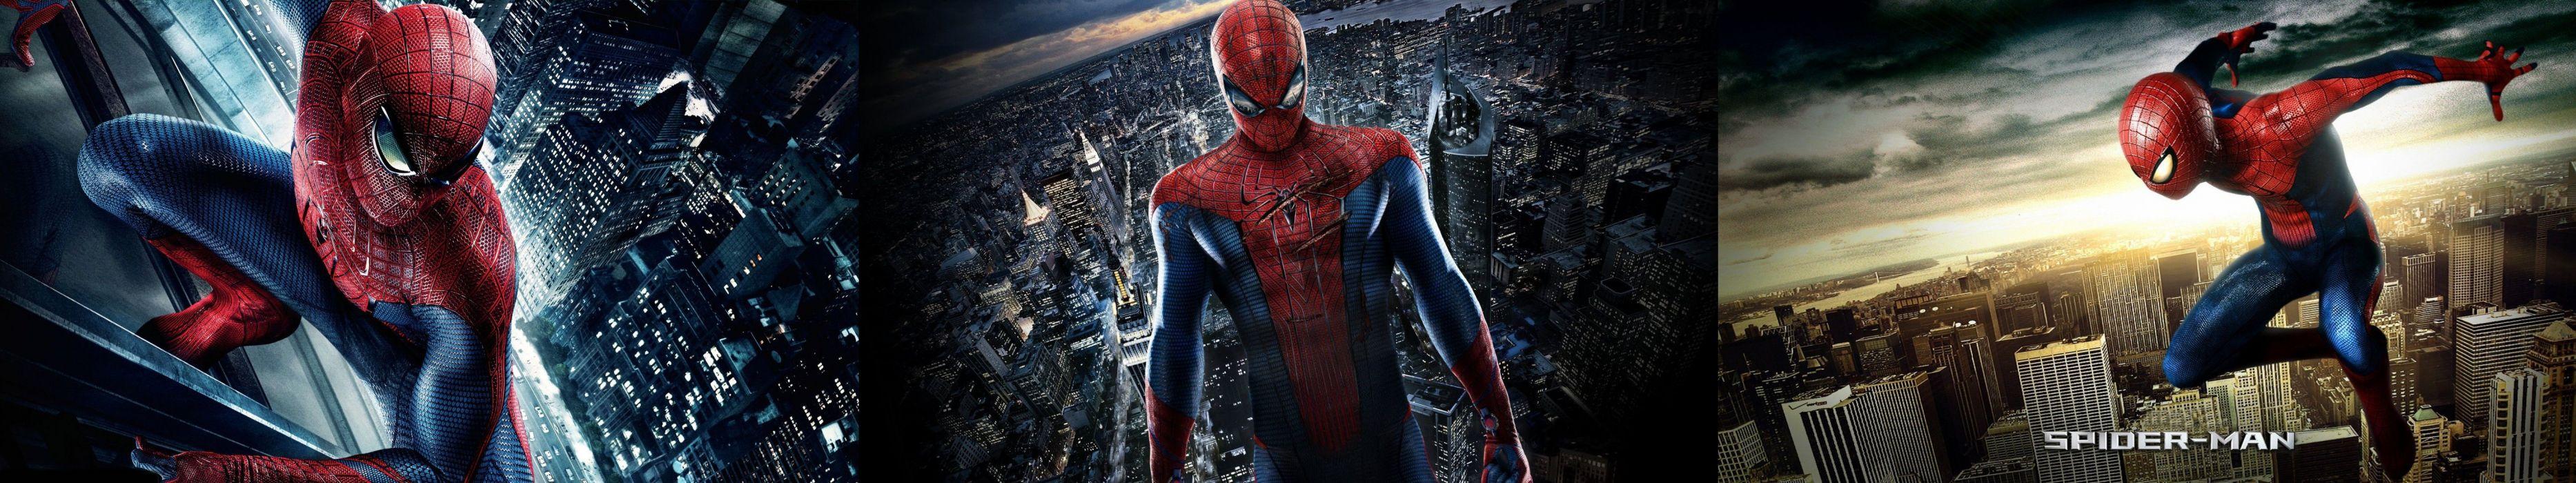 triple screen - multi monitor - multiple - heroes - spiderman wallpaper